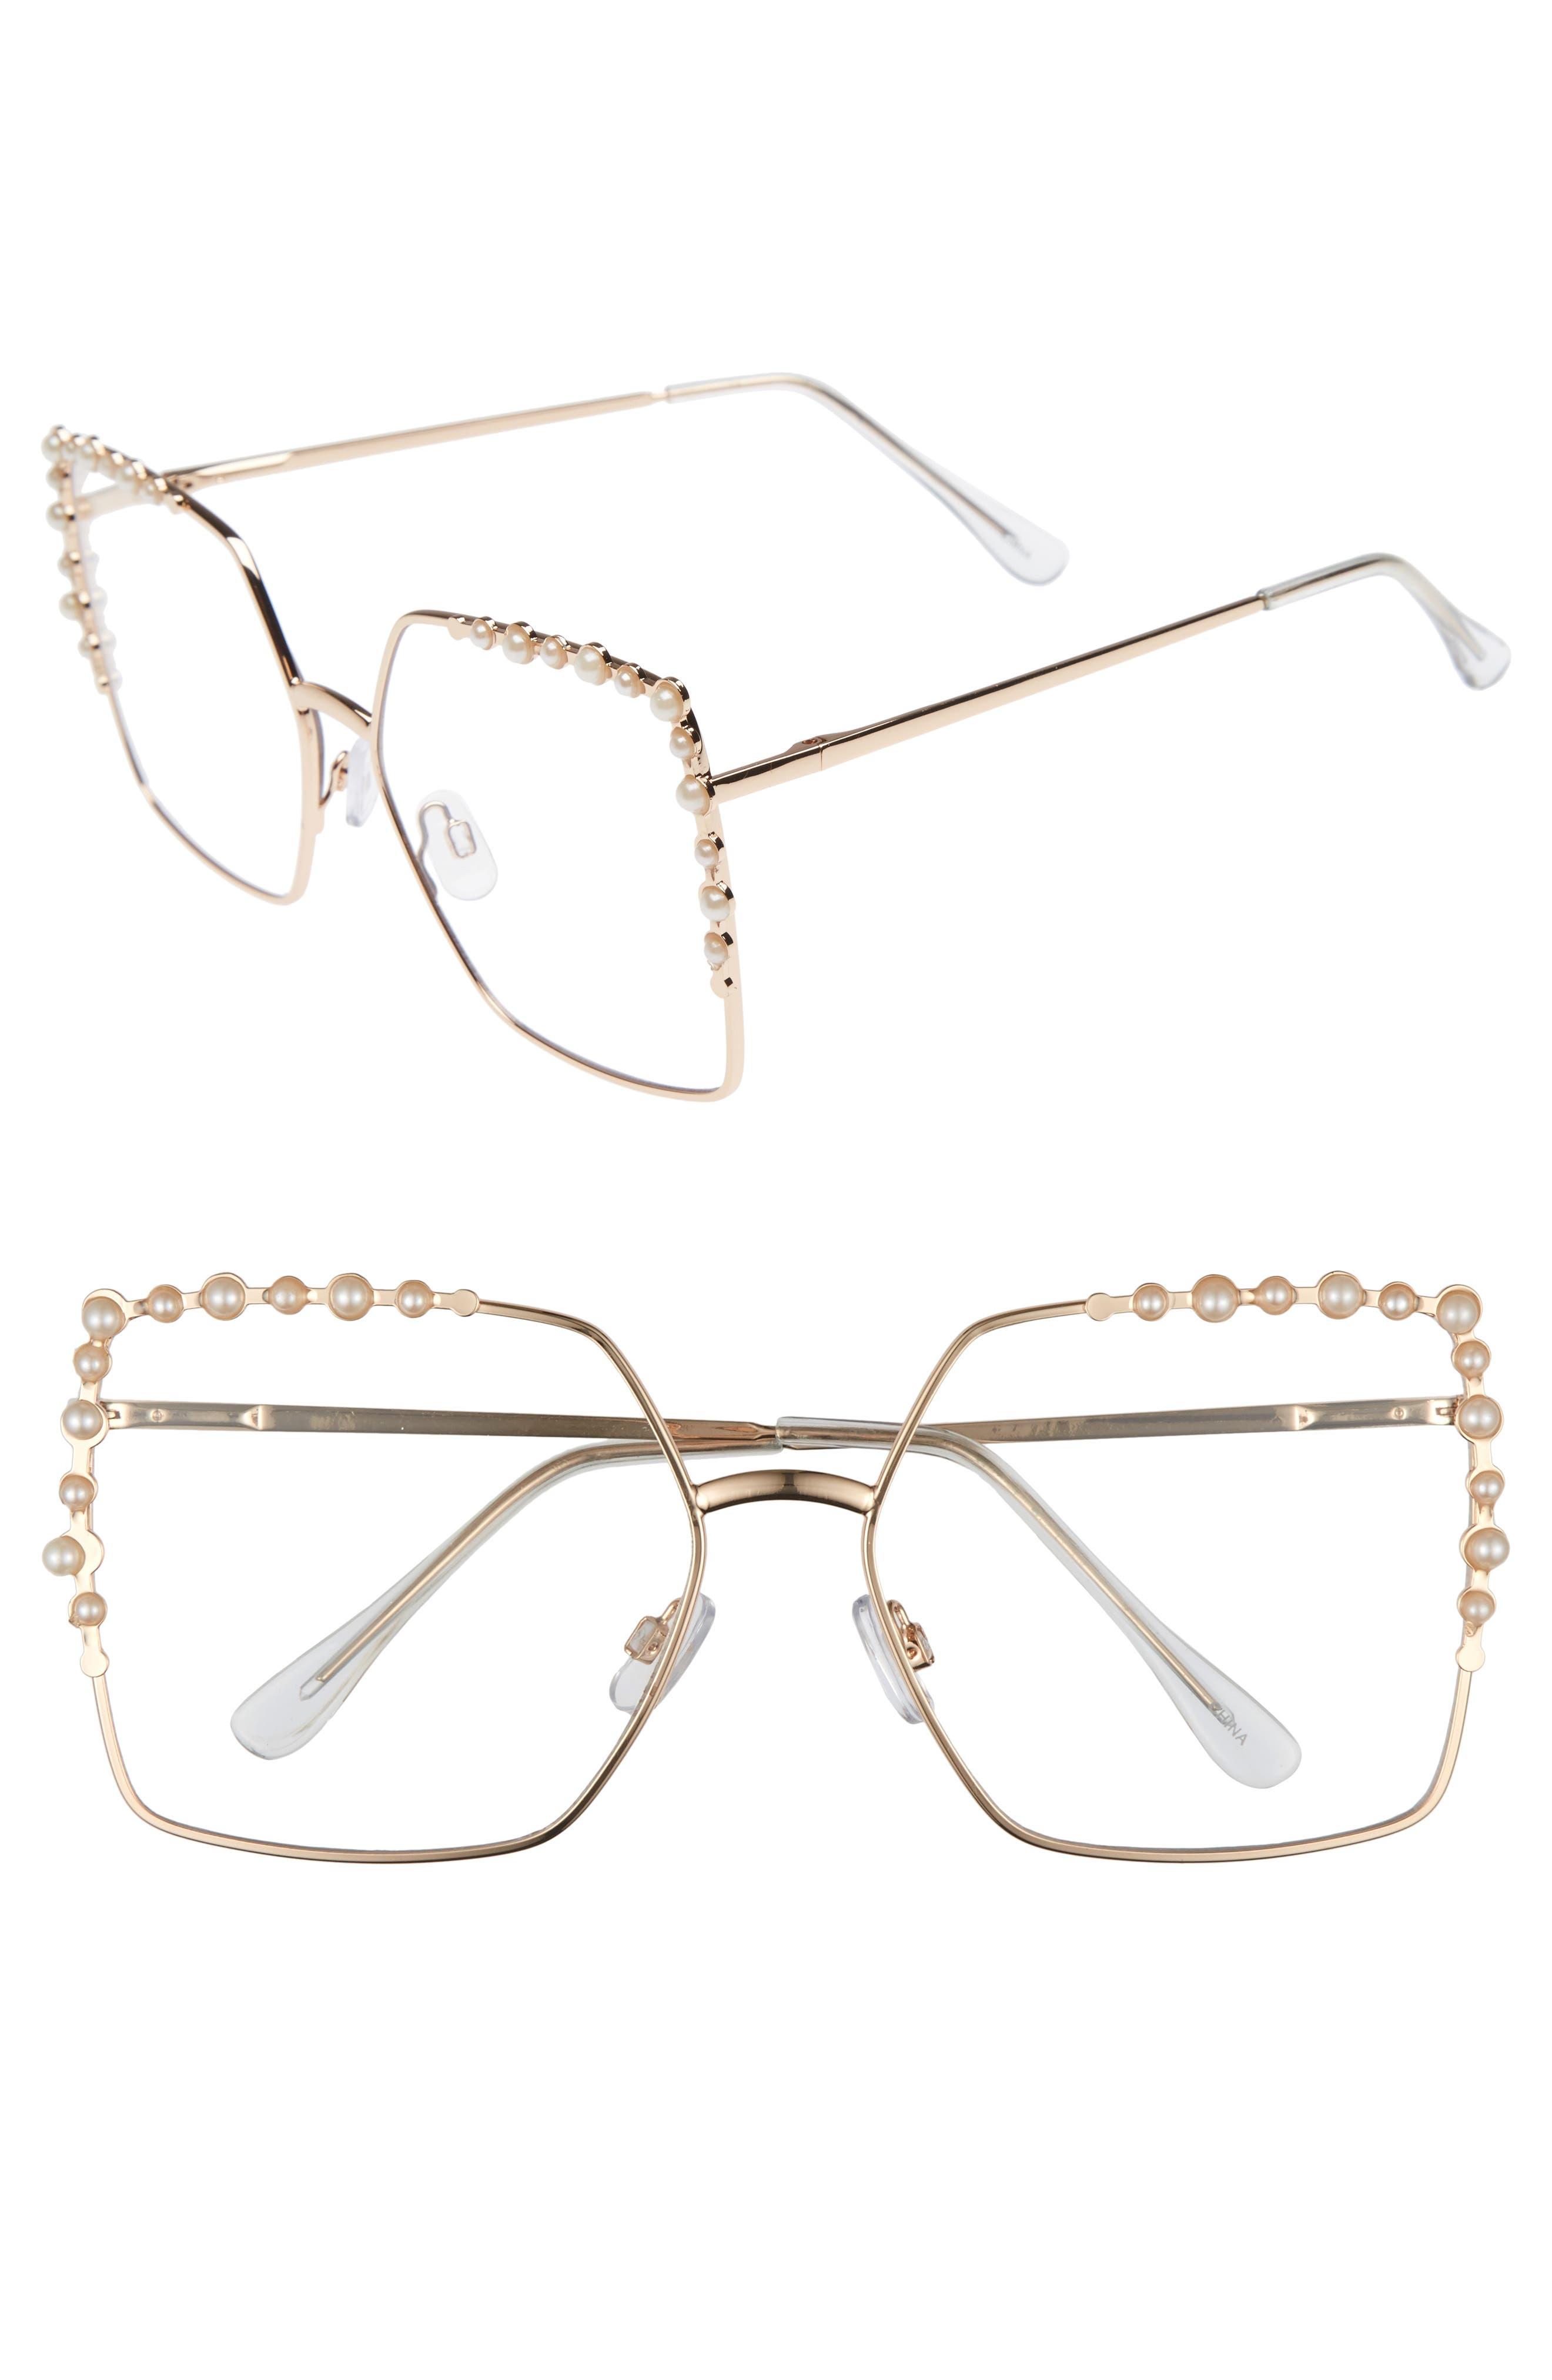 63mm Imitation Pearl Square Fashion Glasses,                         Main,                         color,